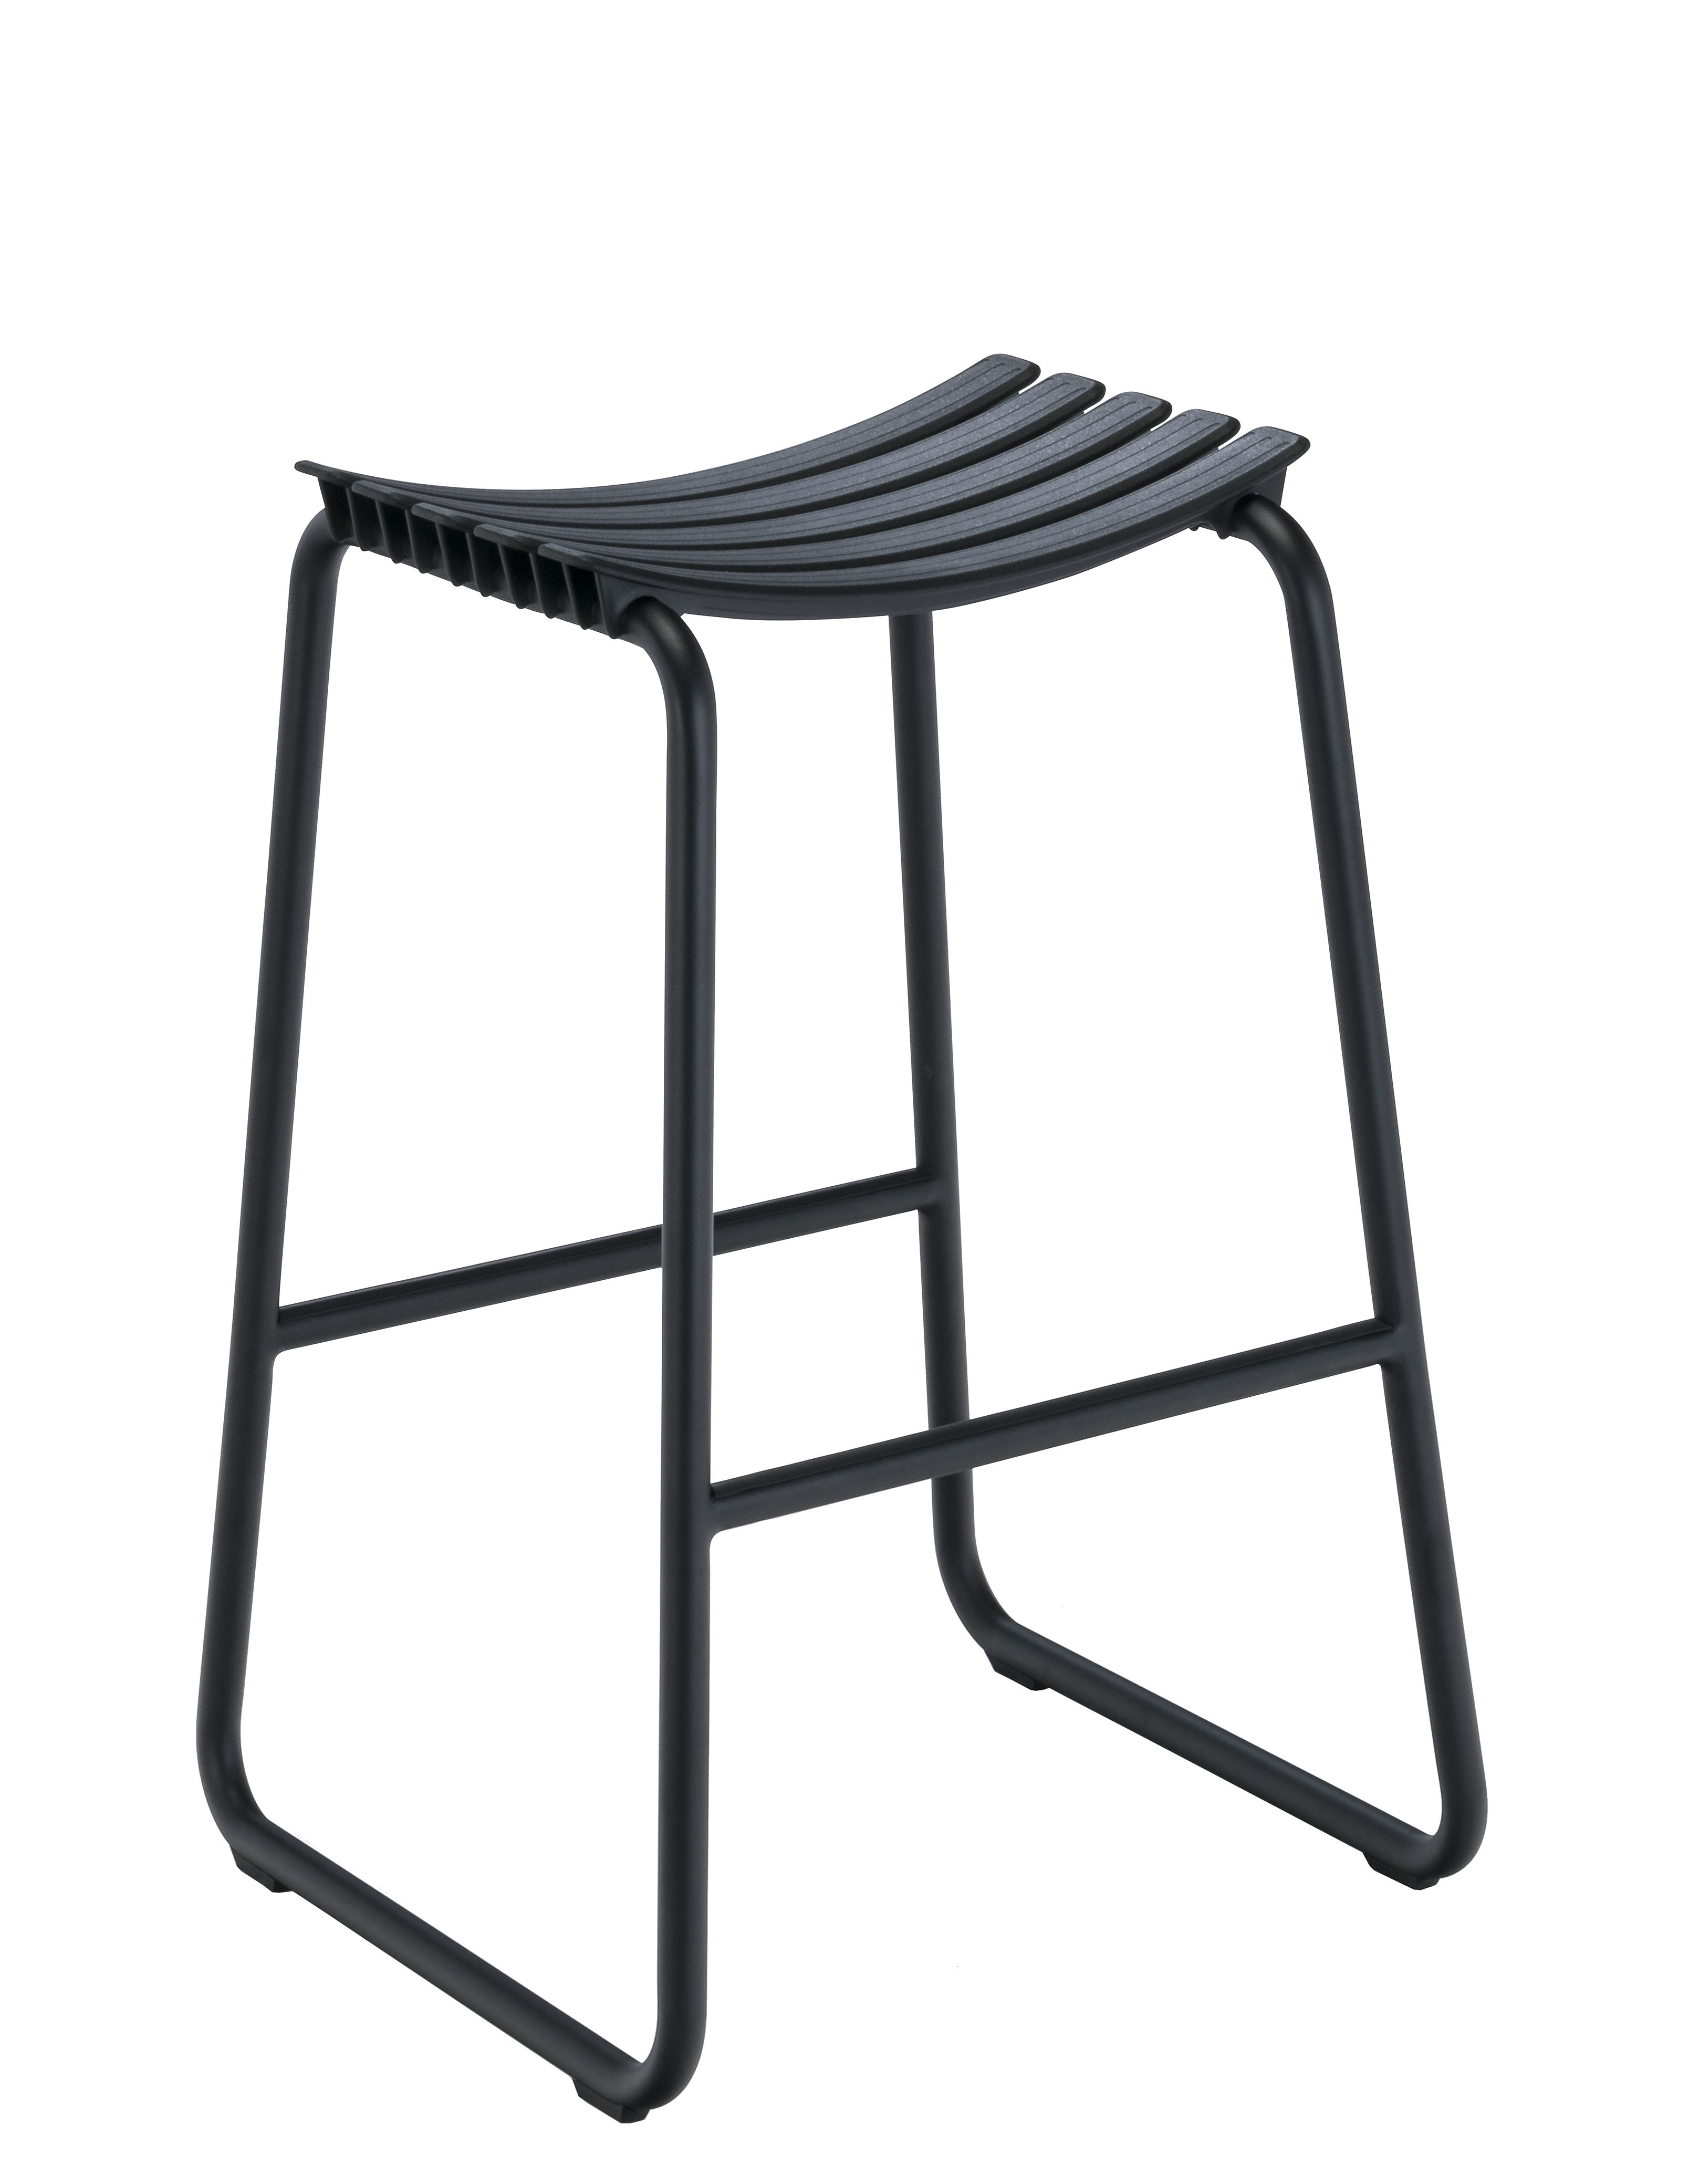 Möbel - Barhocker - Clips Barhocker / H 80 cm - Houe - Schwarz - Aluminium, Plastikmaterial